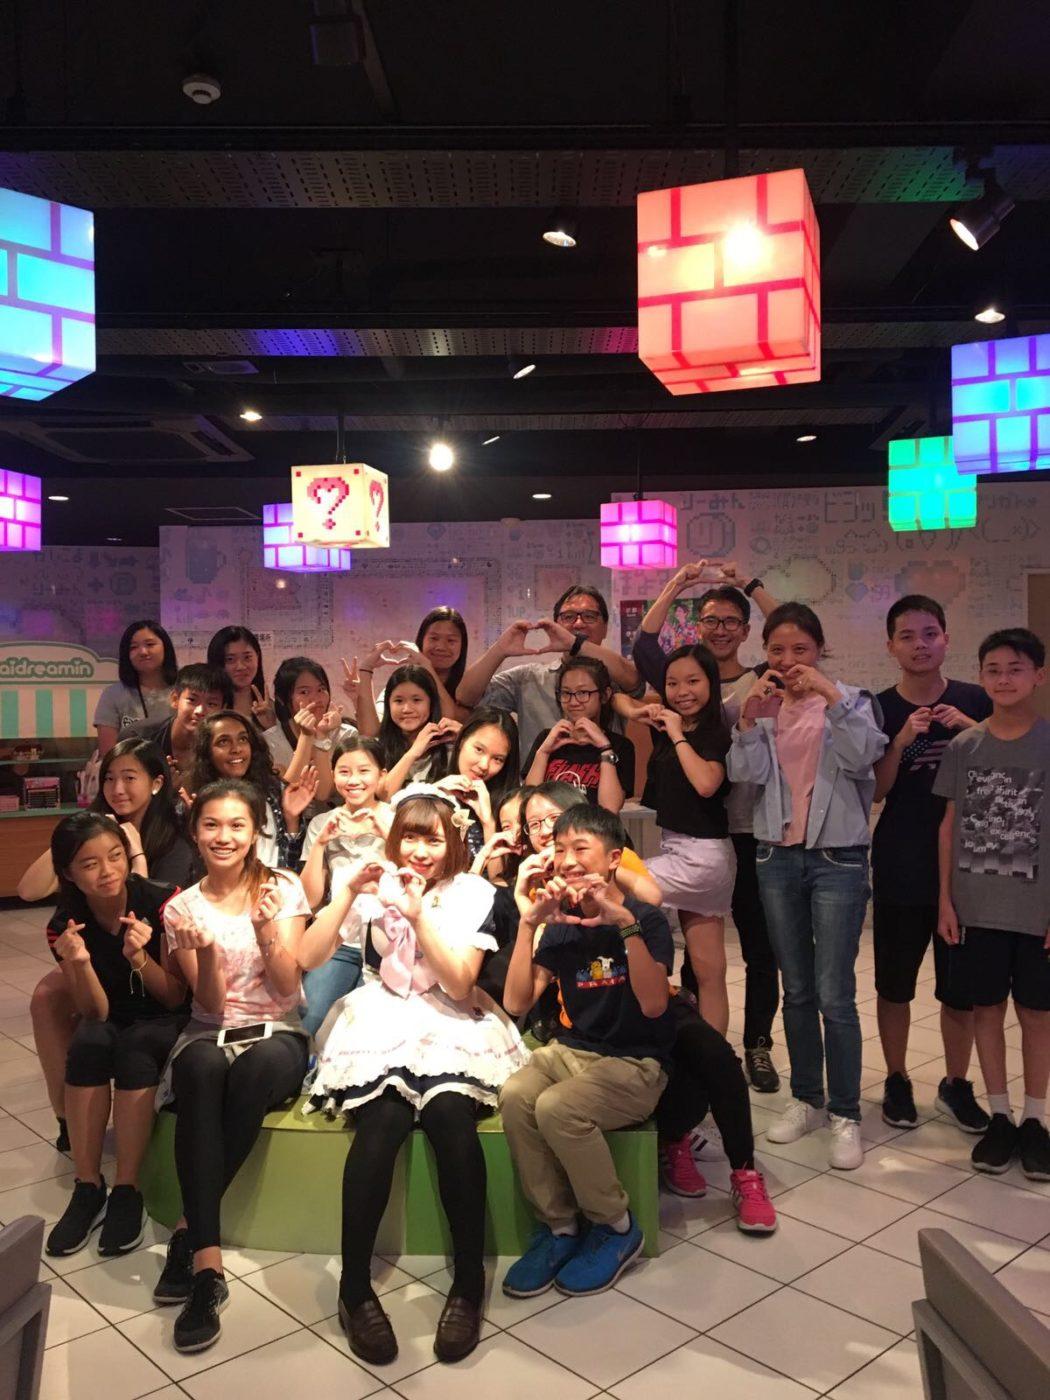 http://shatincollege.edu.hk/wp-content/uploads/2017/09/IMG-2127.jpg